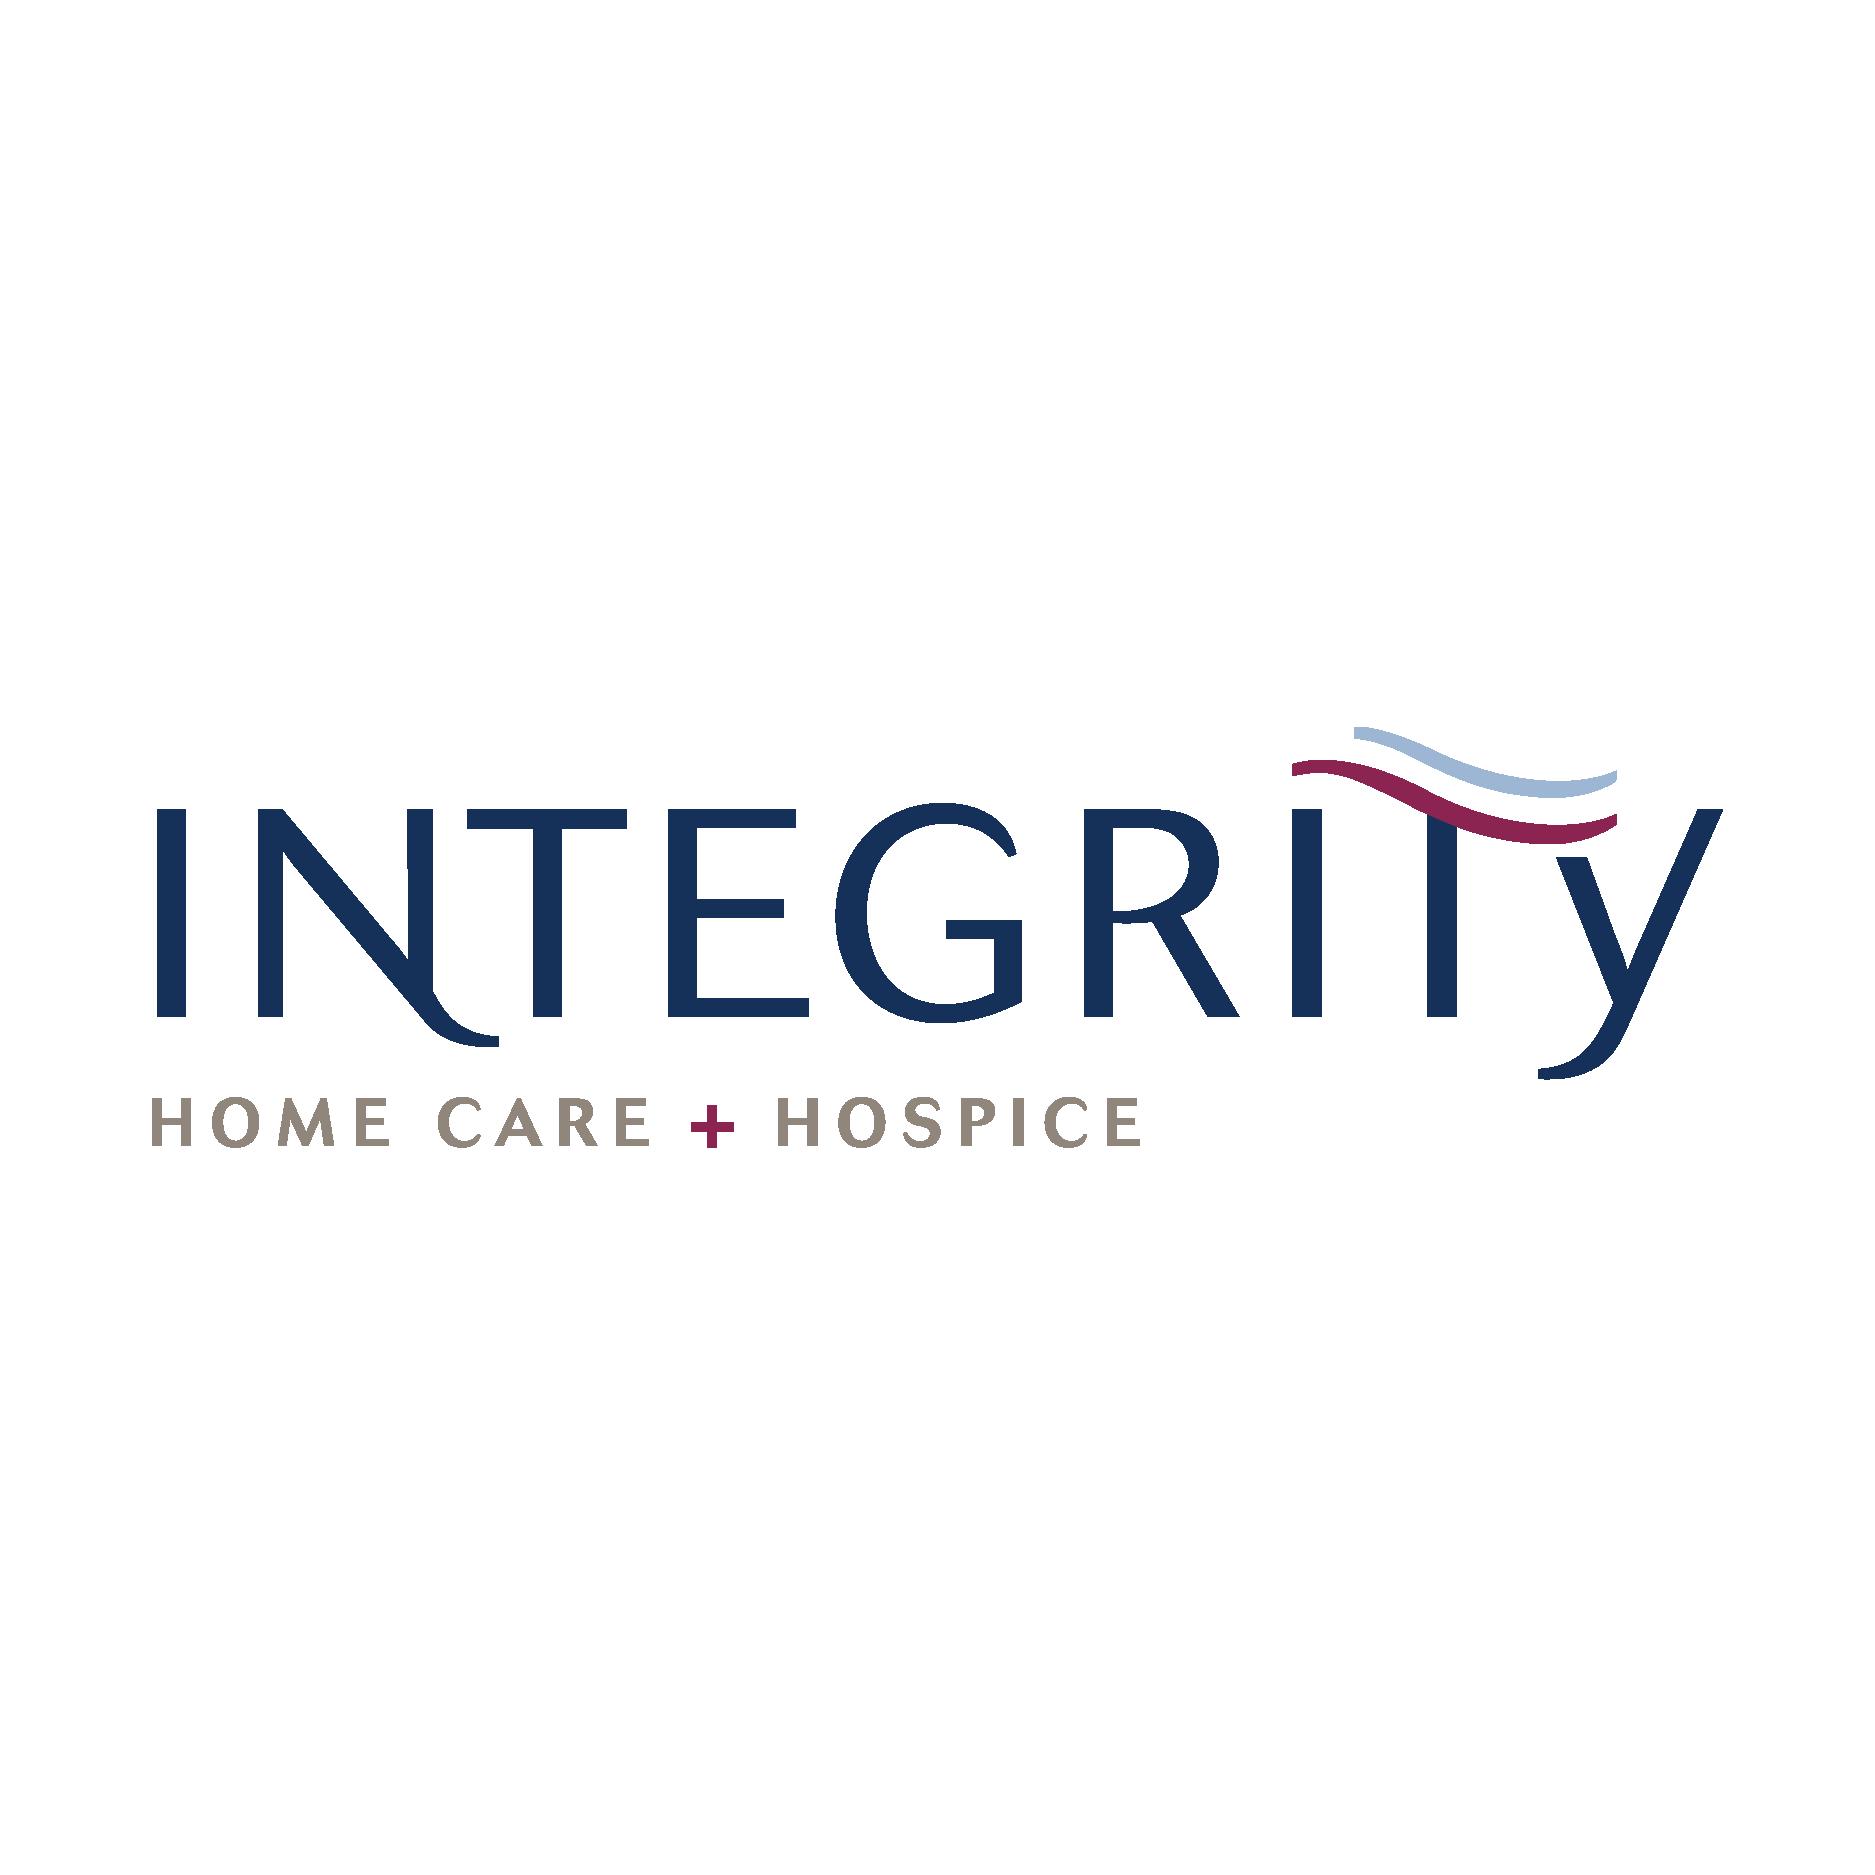 Auto Body Repair In Joplin Mo: Integrity Home Care + Hospice Joplin, MO 64804